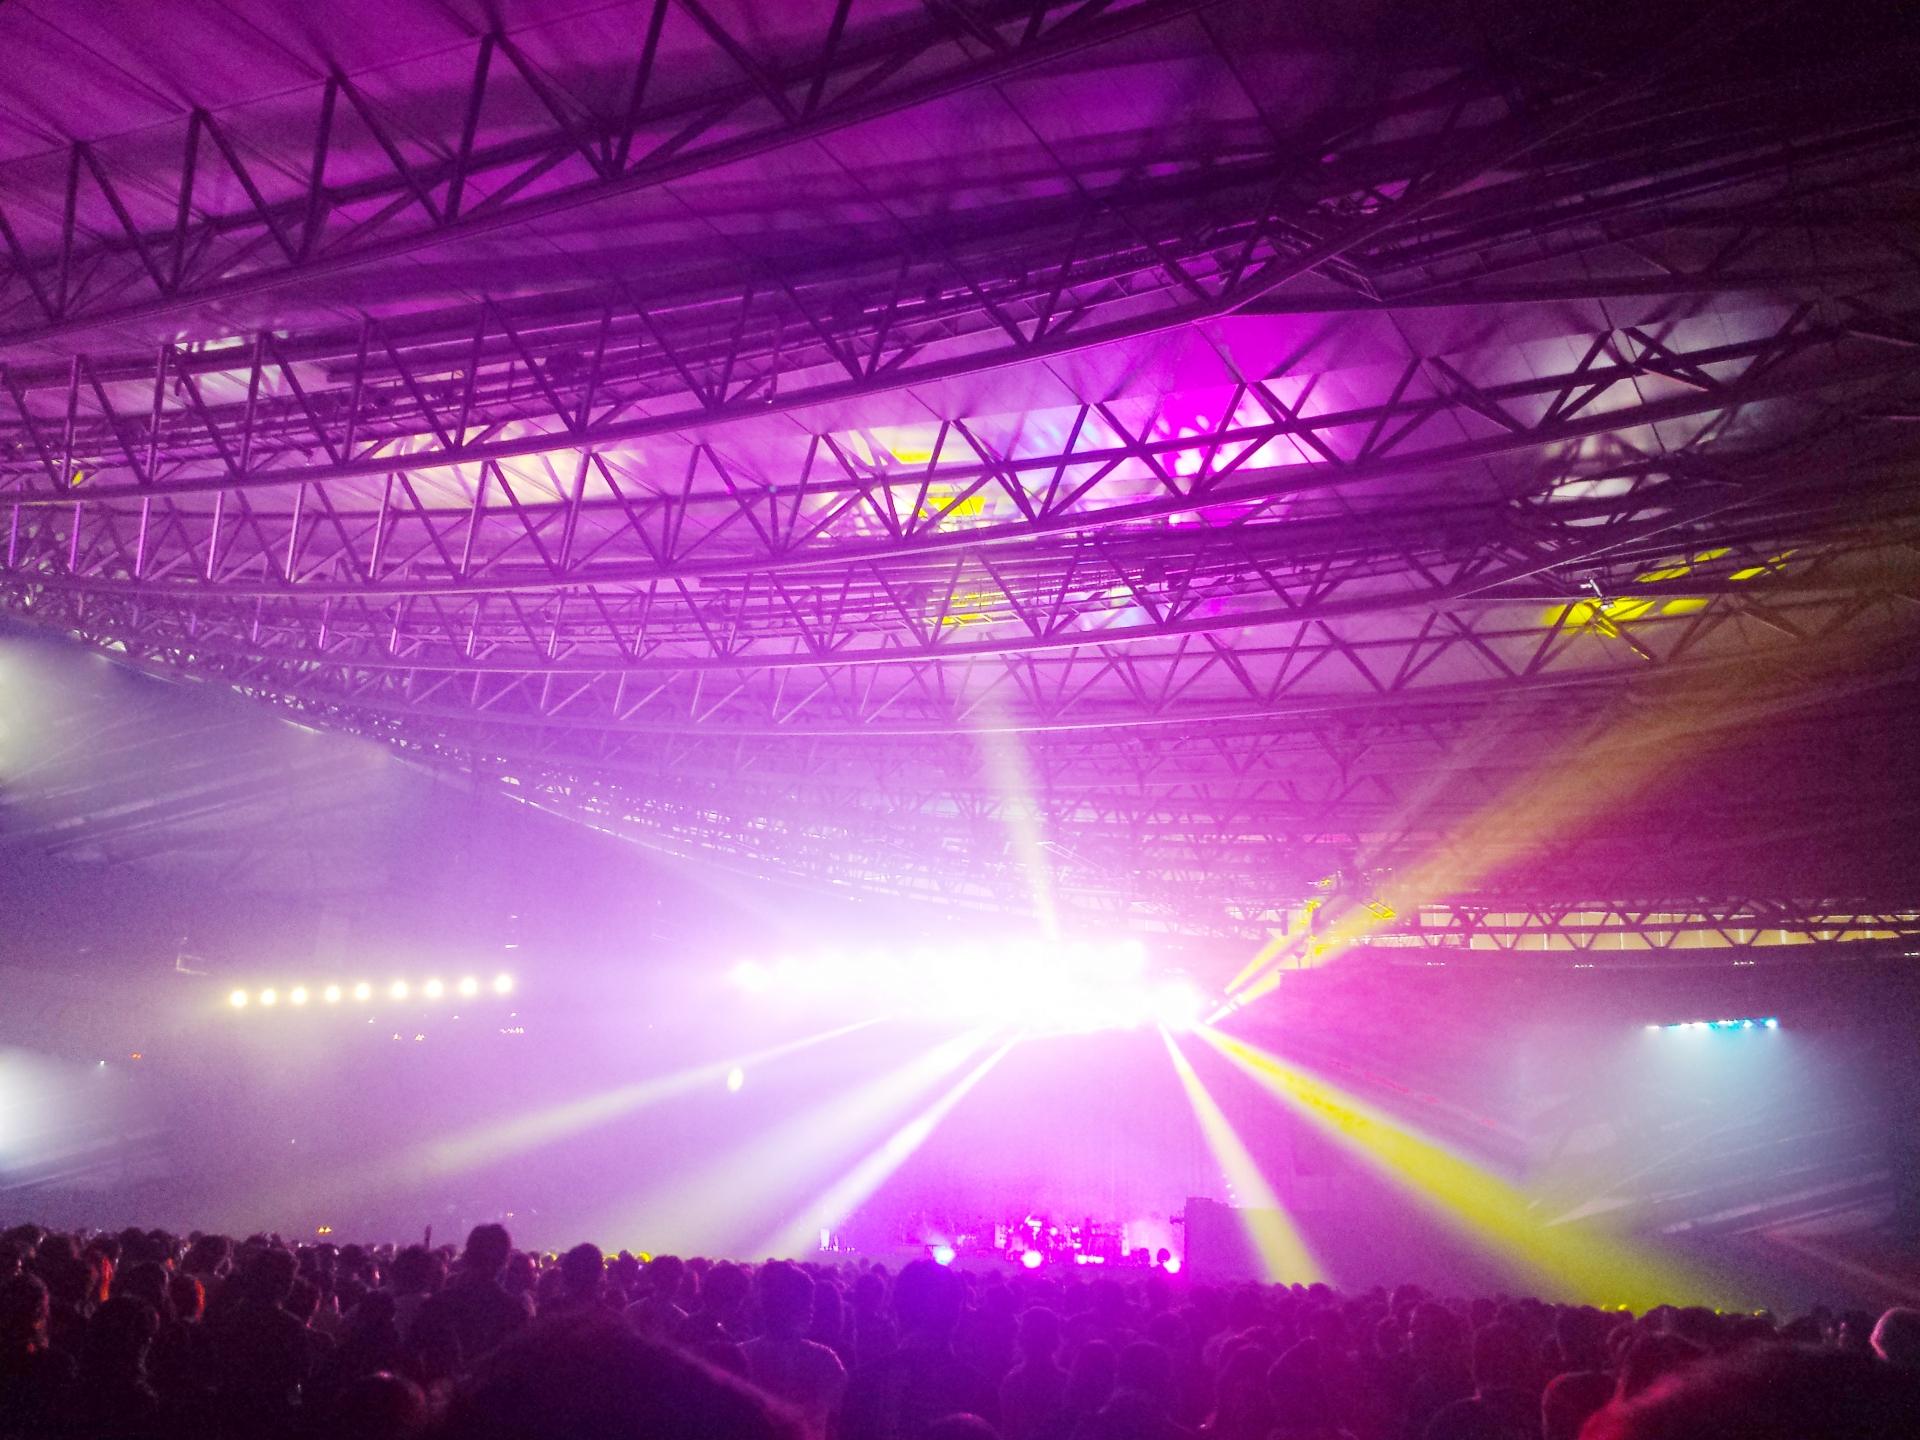 ONE OK ROCKおすすめ曲をまとめてみた!(5位~1位)